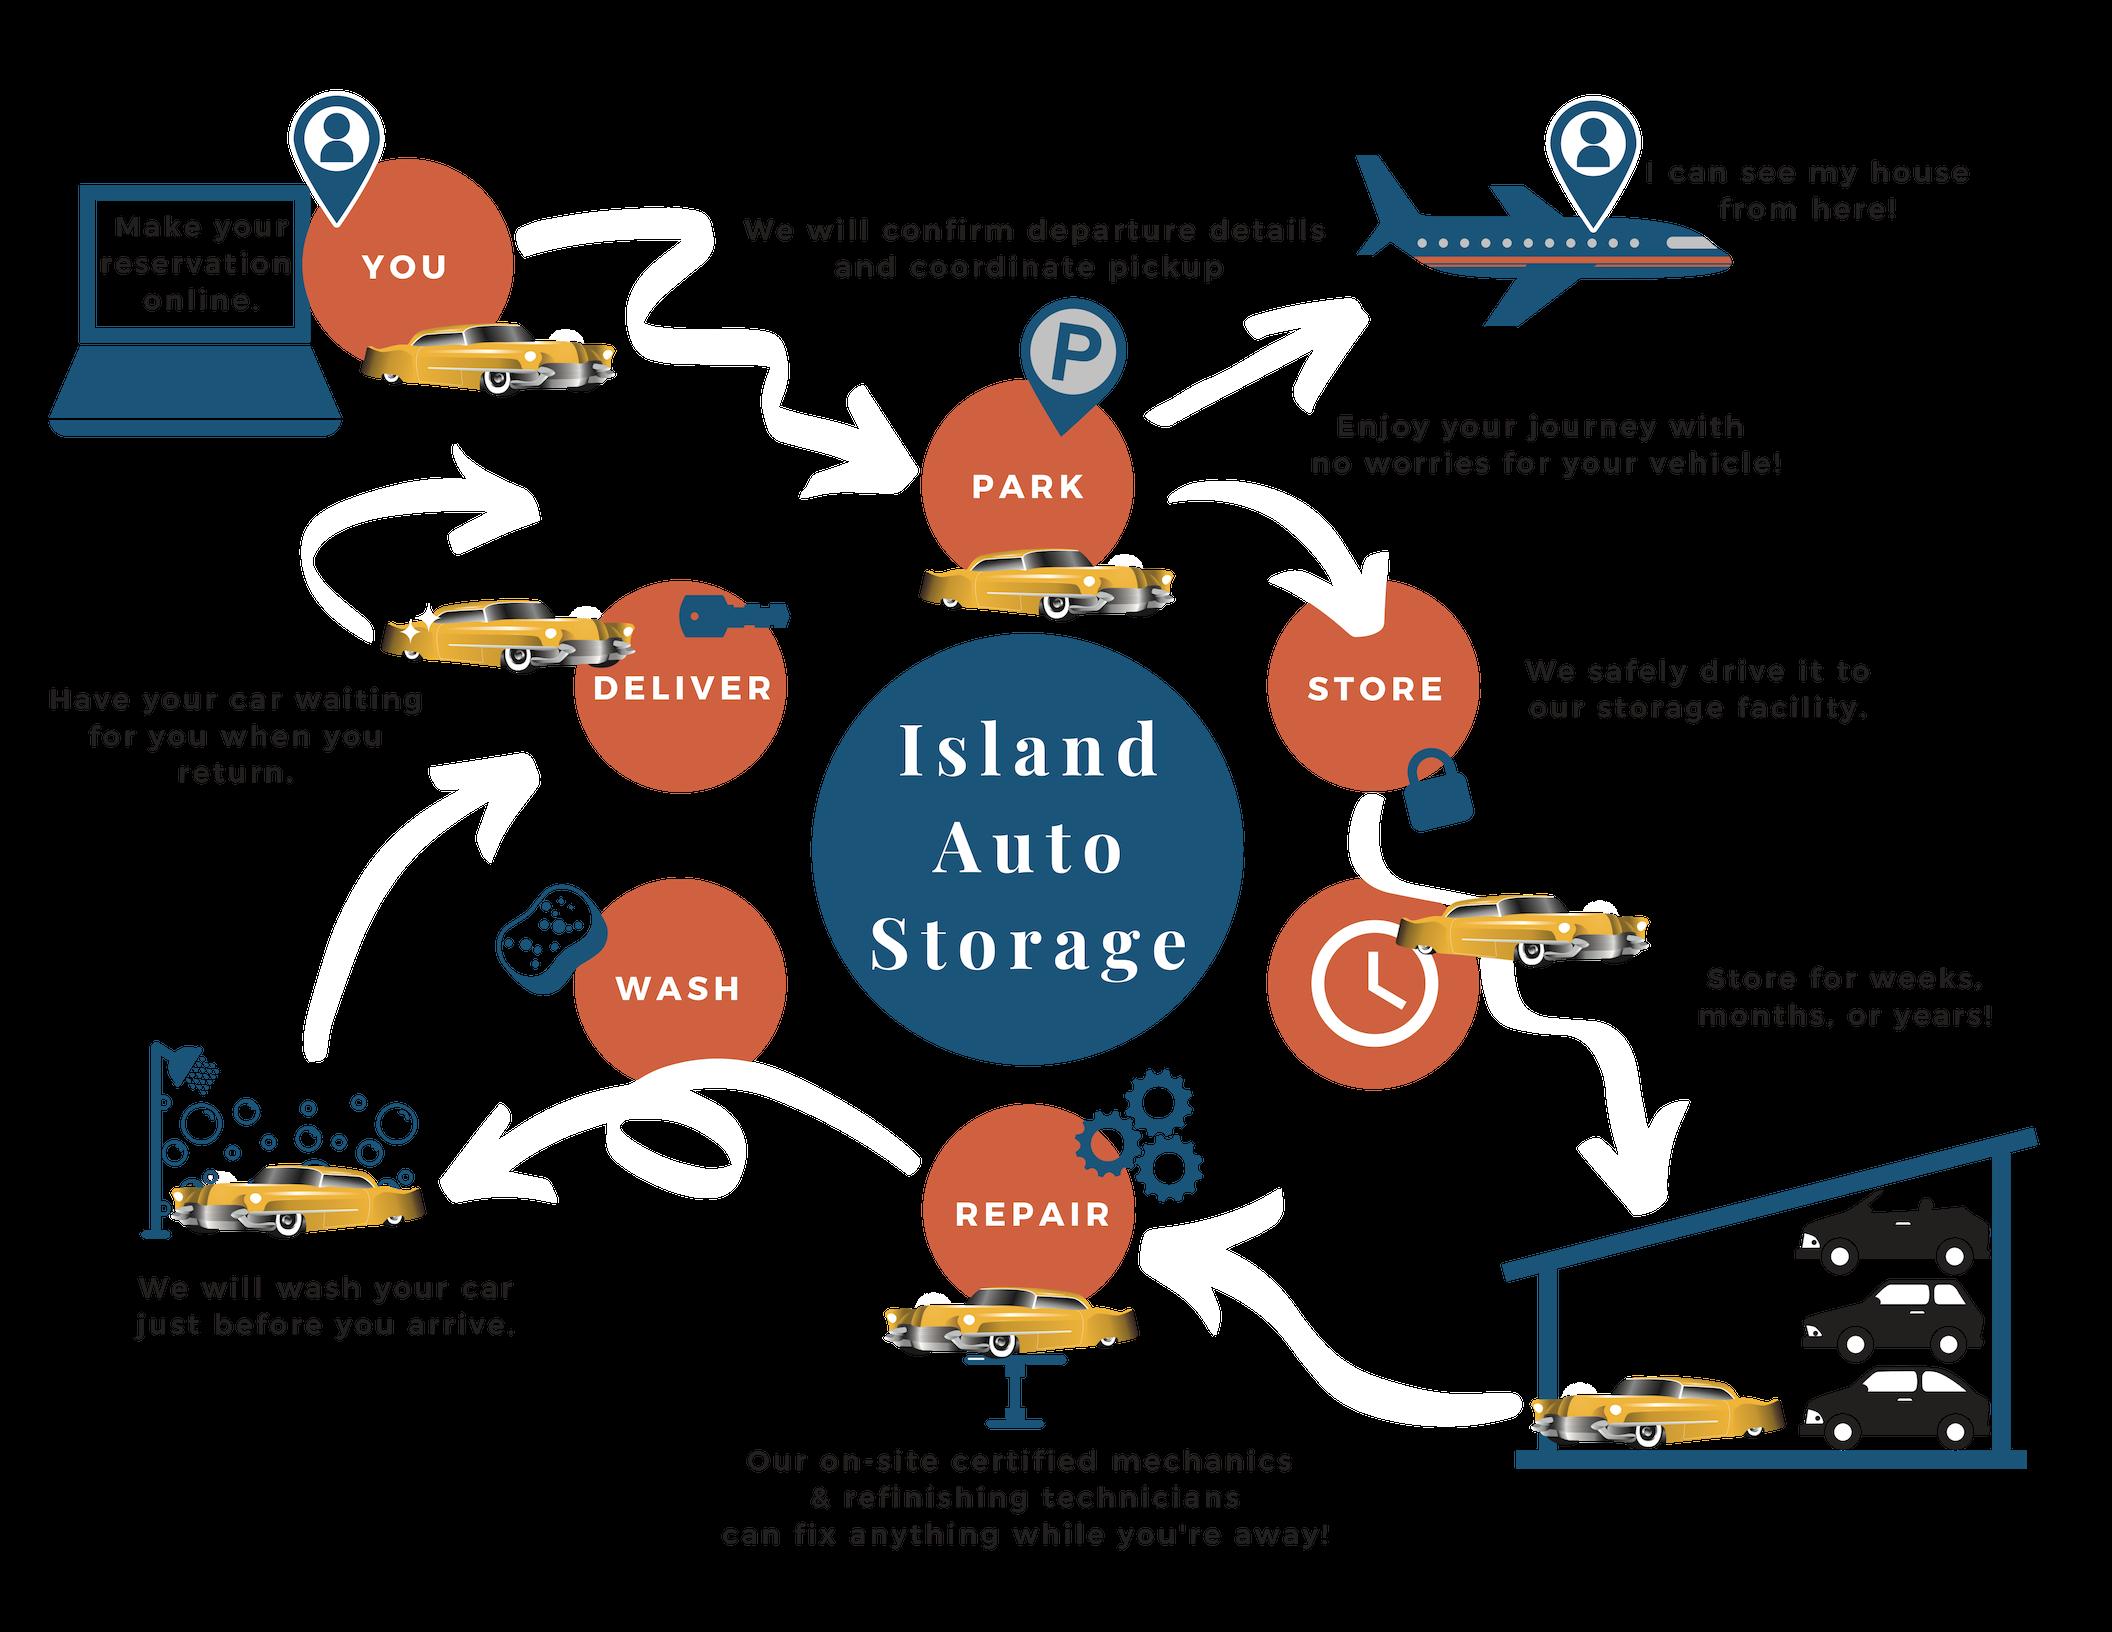 Island Auto Storage Flyer (1).png